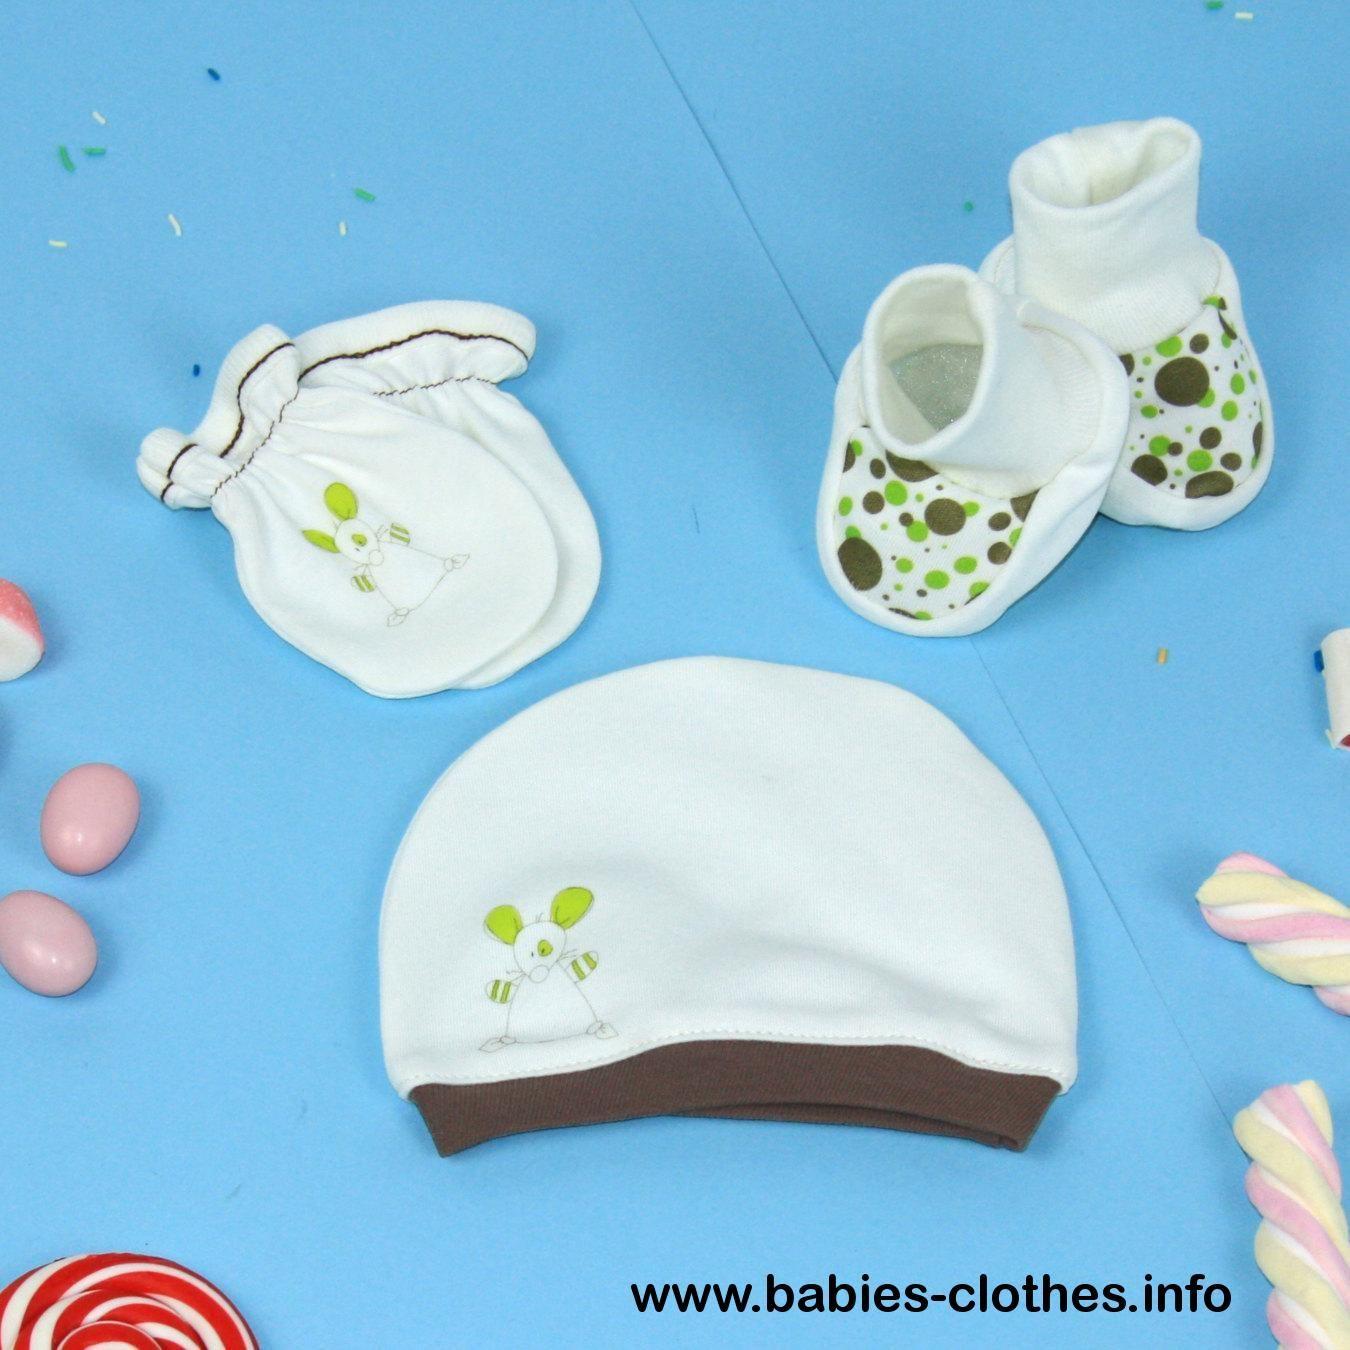 Designer Baby Set 3 Pcs Mittens Hat Socks Organic Cotton